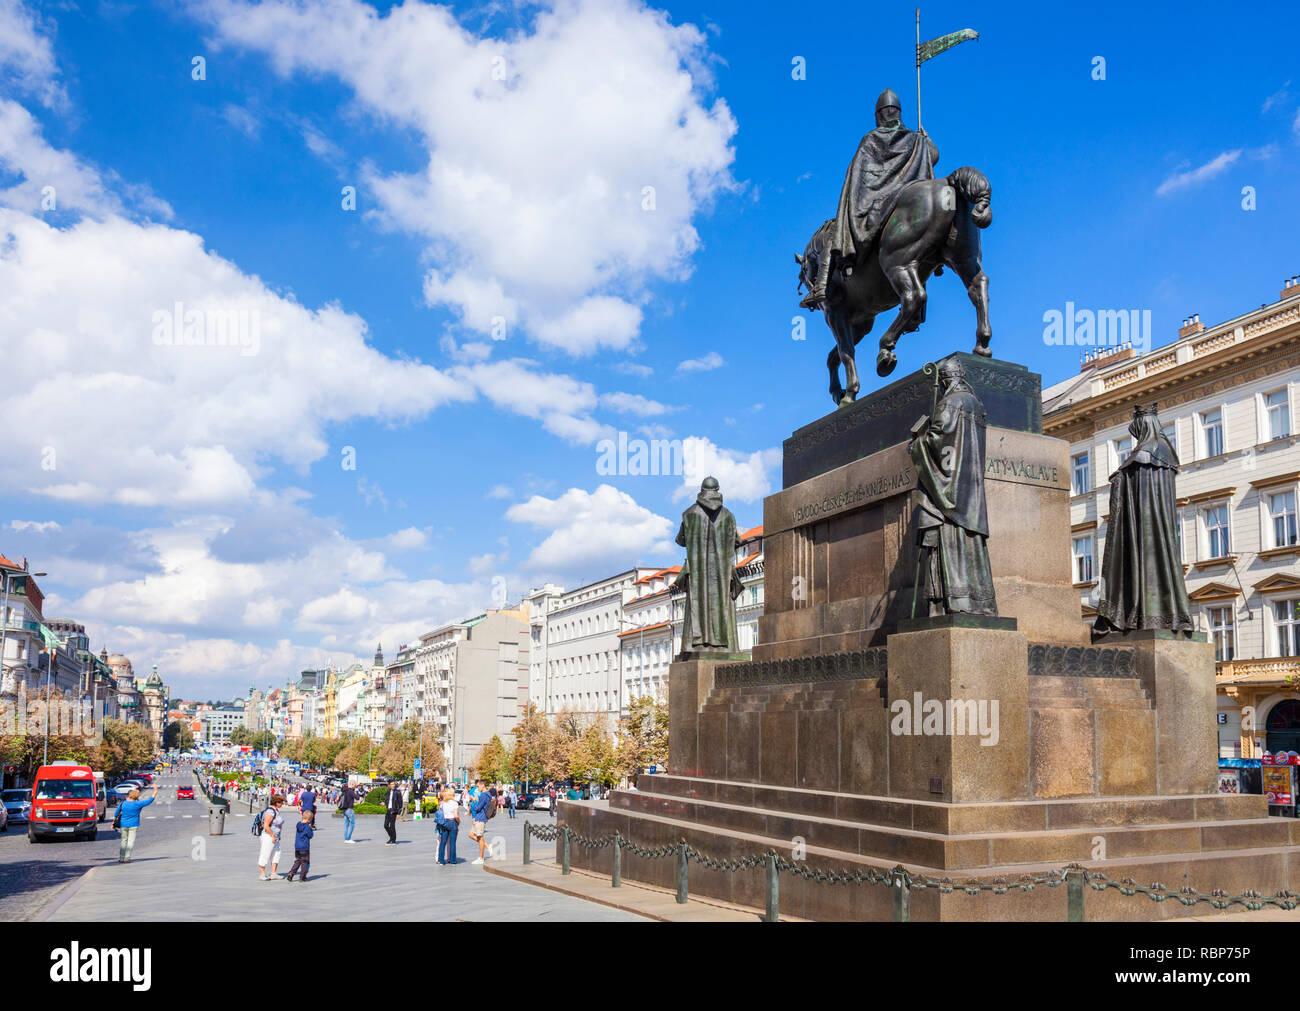 Estatua de San Wenceslao de Praga Monumento Wenceslao Wenceslas Square Praga República Checa Europa Imagen De Stock